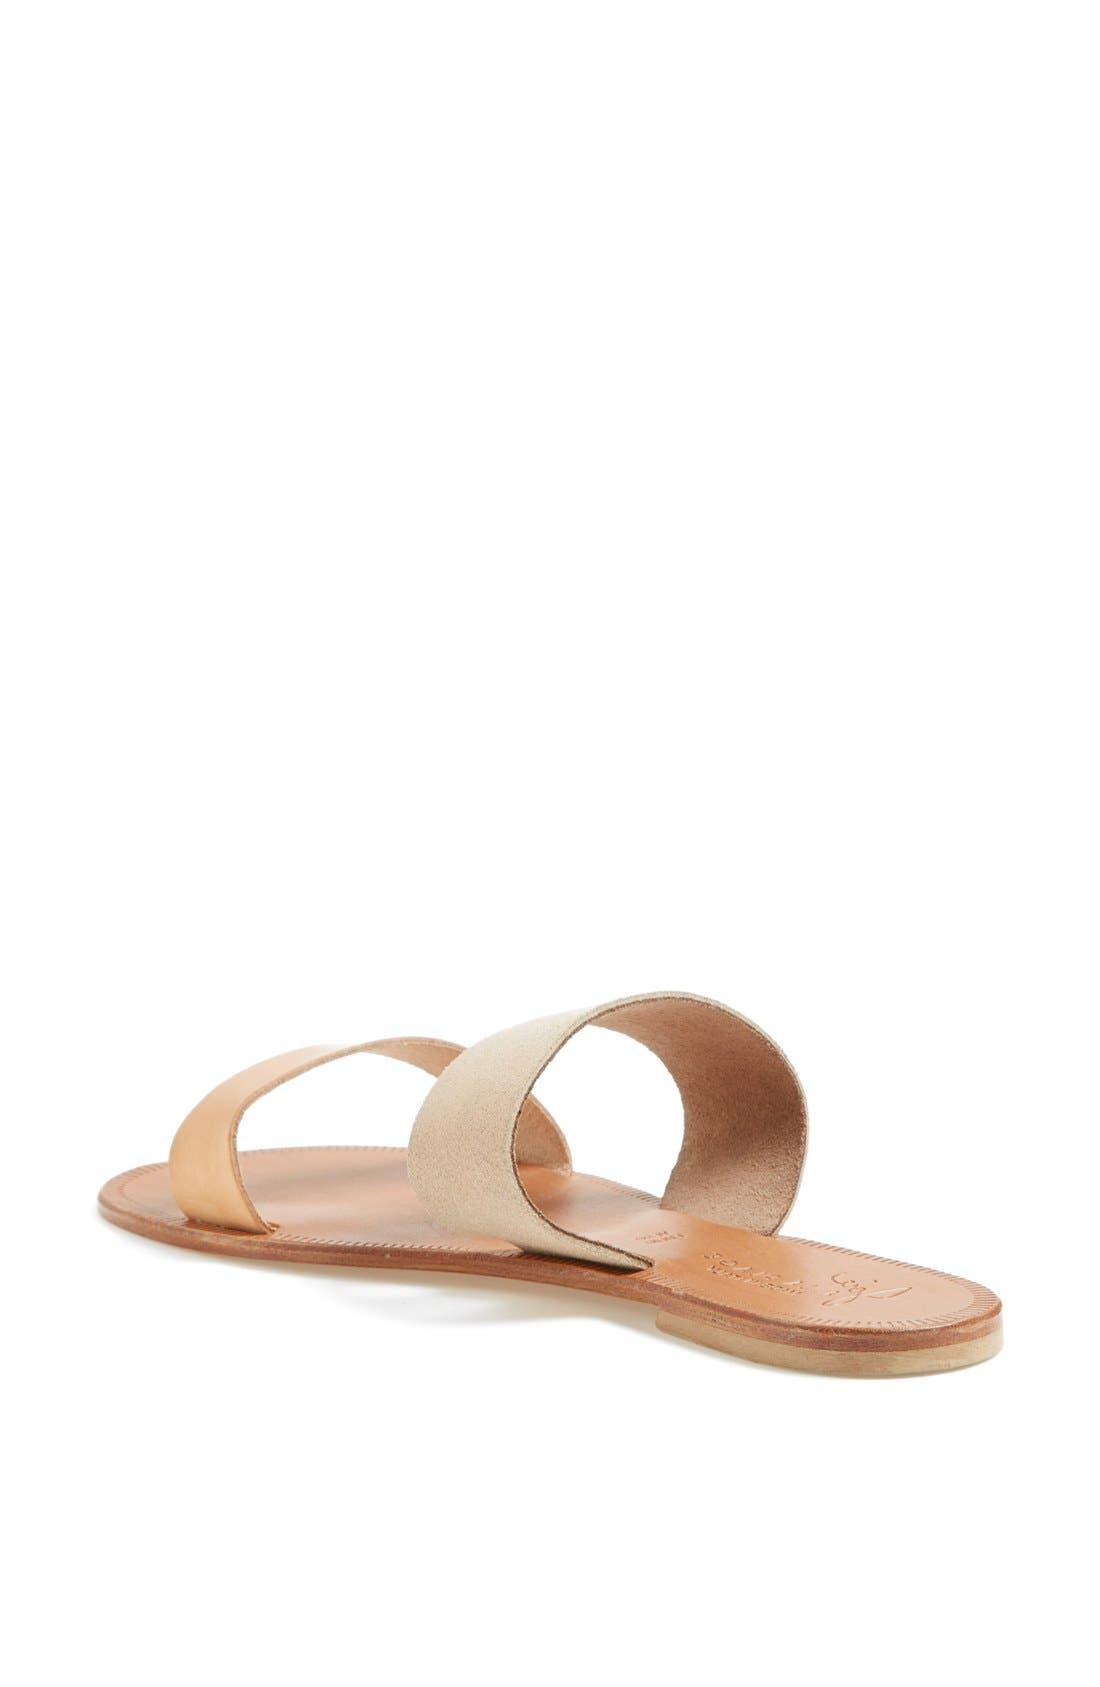 Alternate Image 2  - Joie a la Plage 'Sable' Leather Slip-On Sandal (Women)